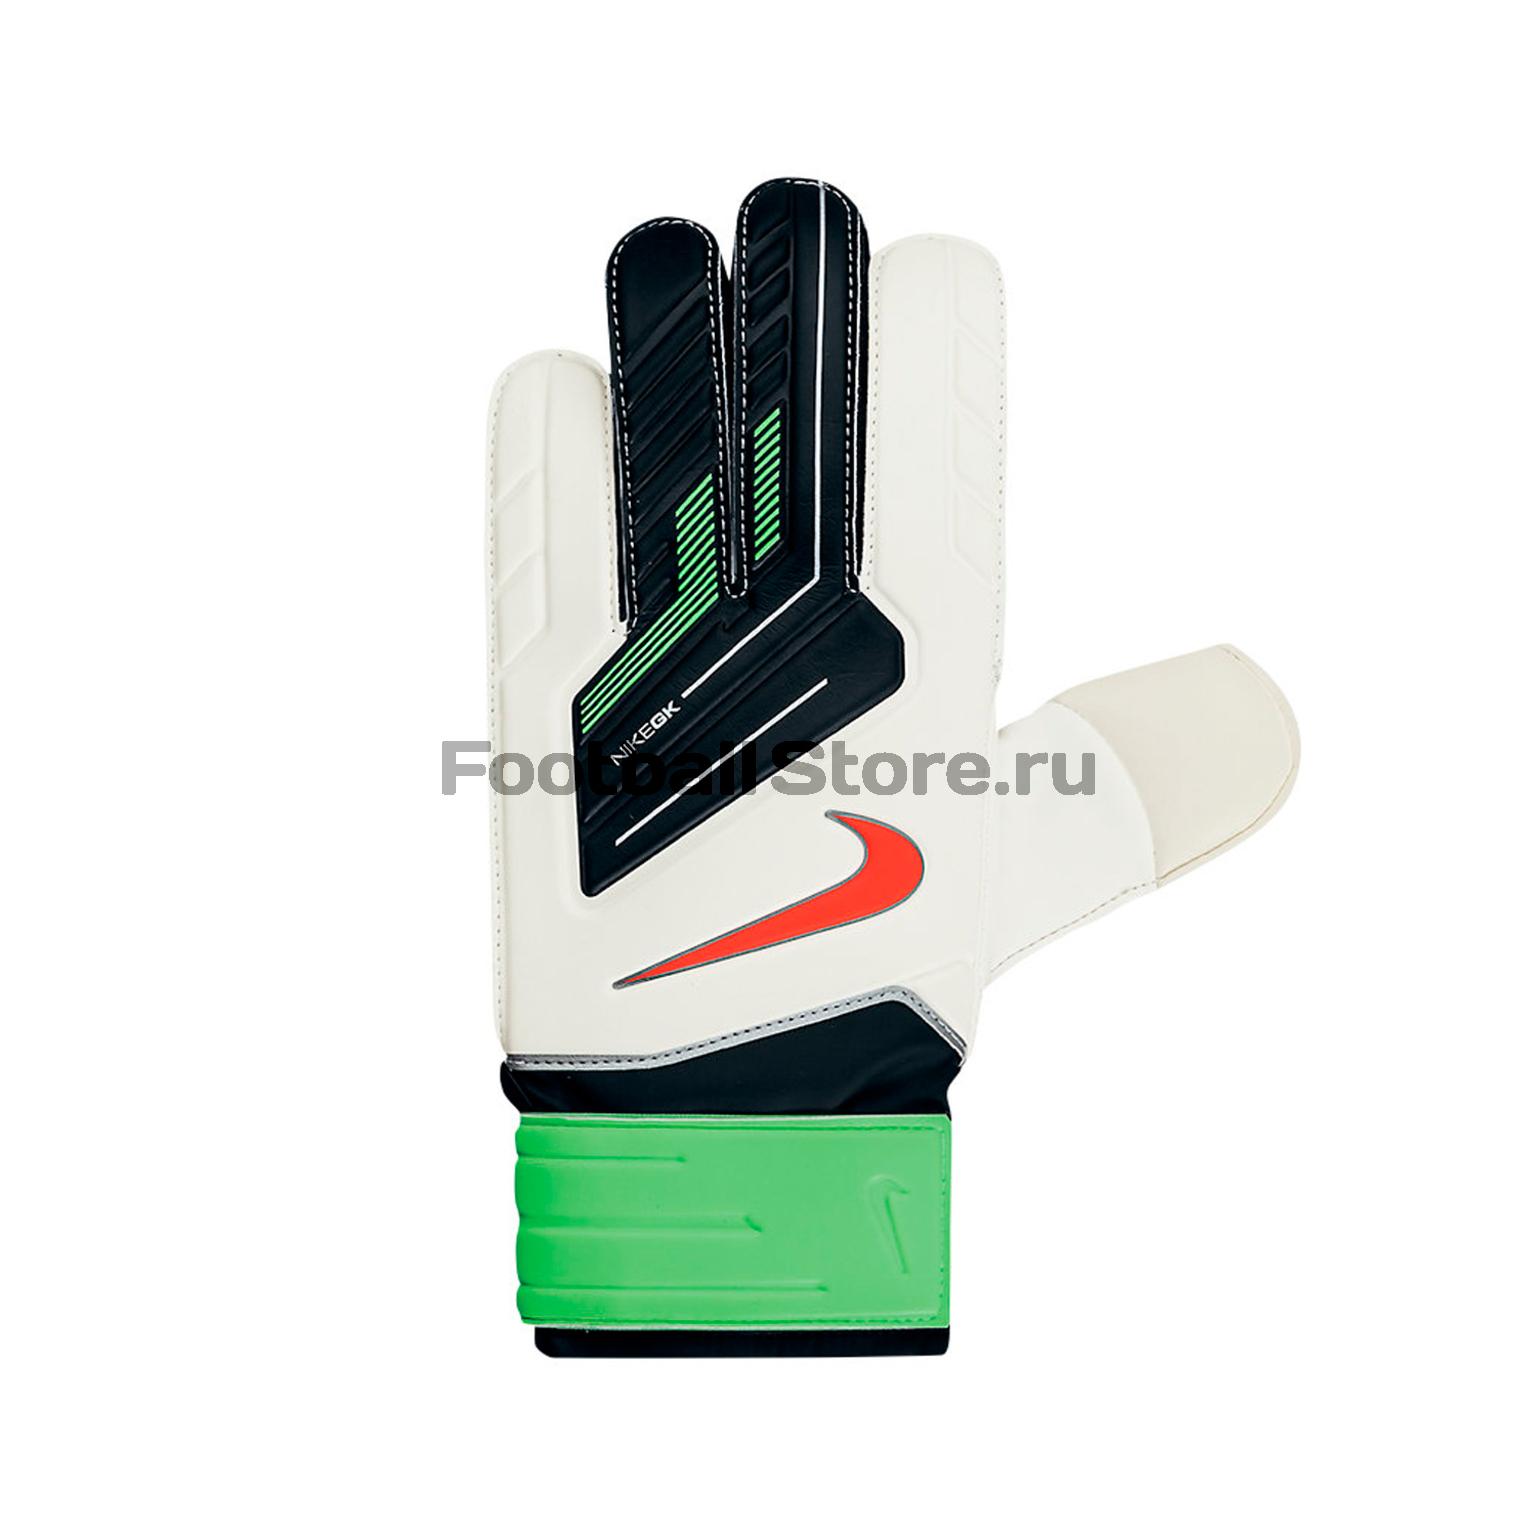 Перчатки Nike Перчатки вратарские Nike GK Classic GS0248-108